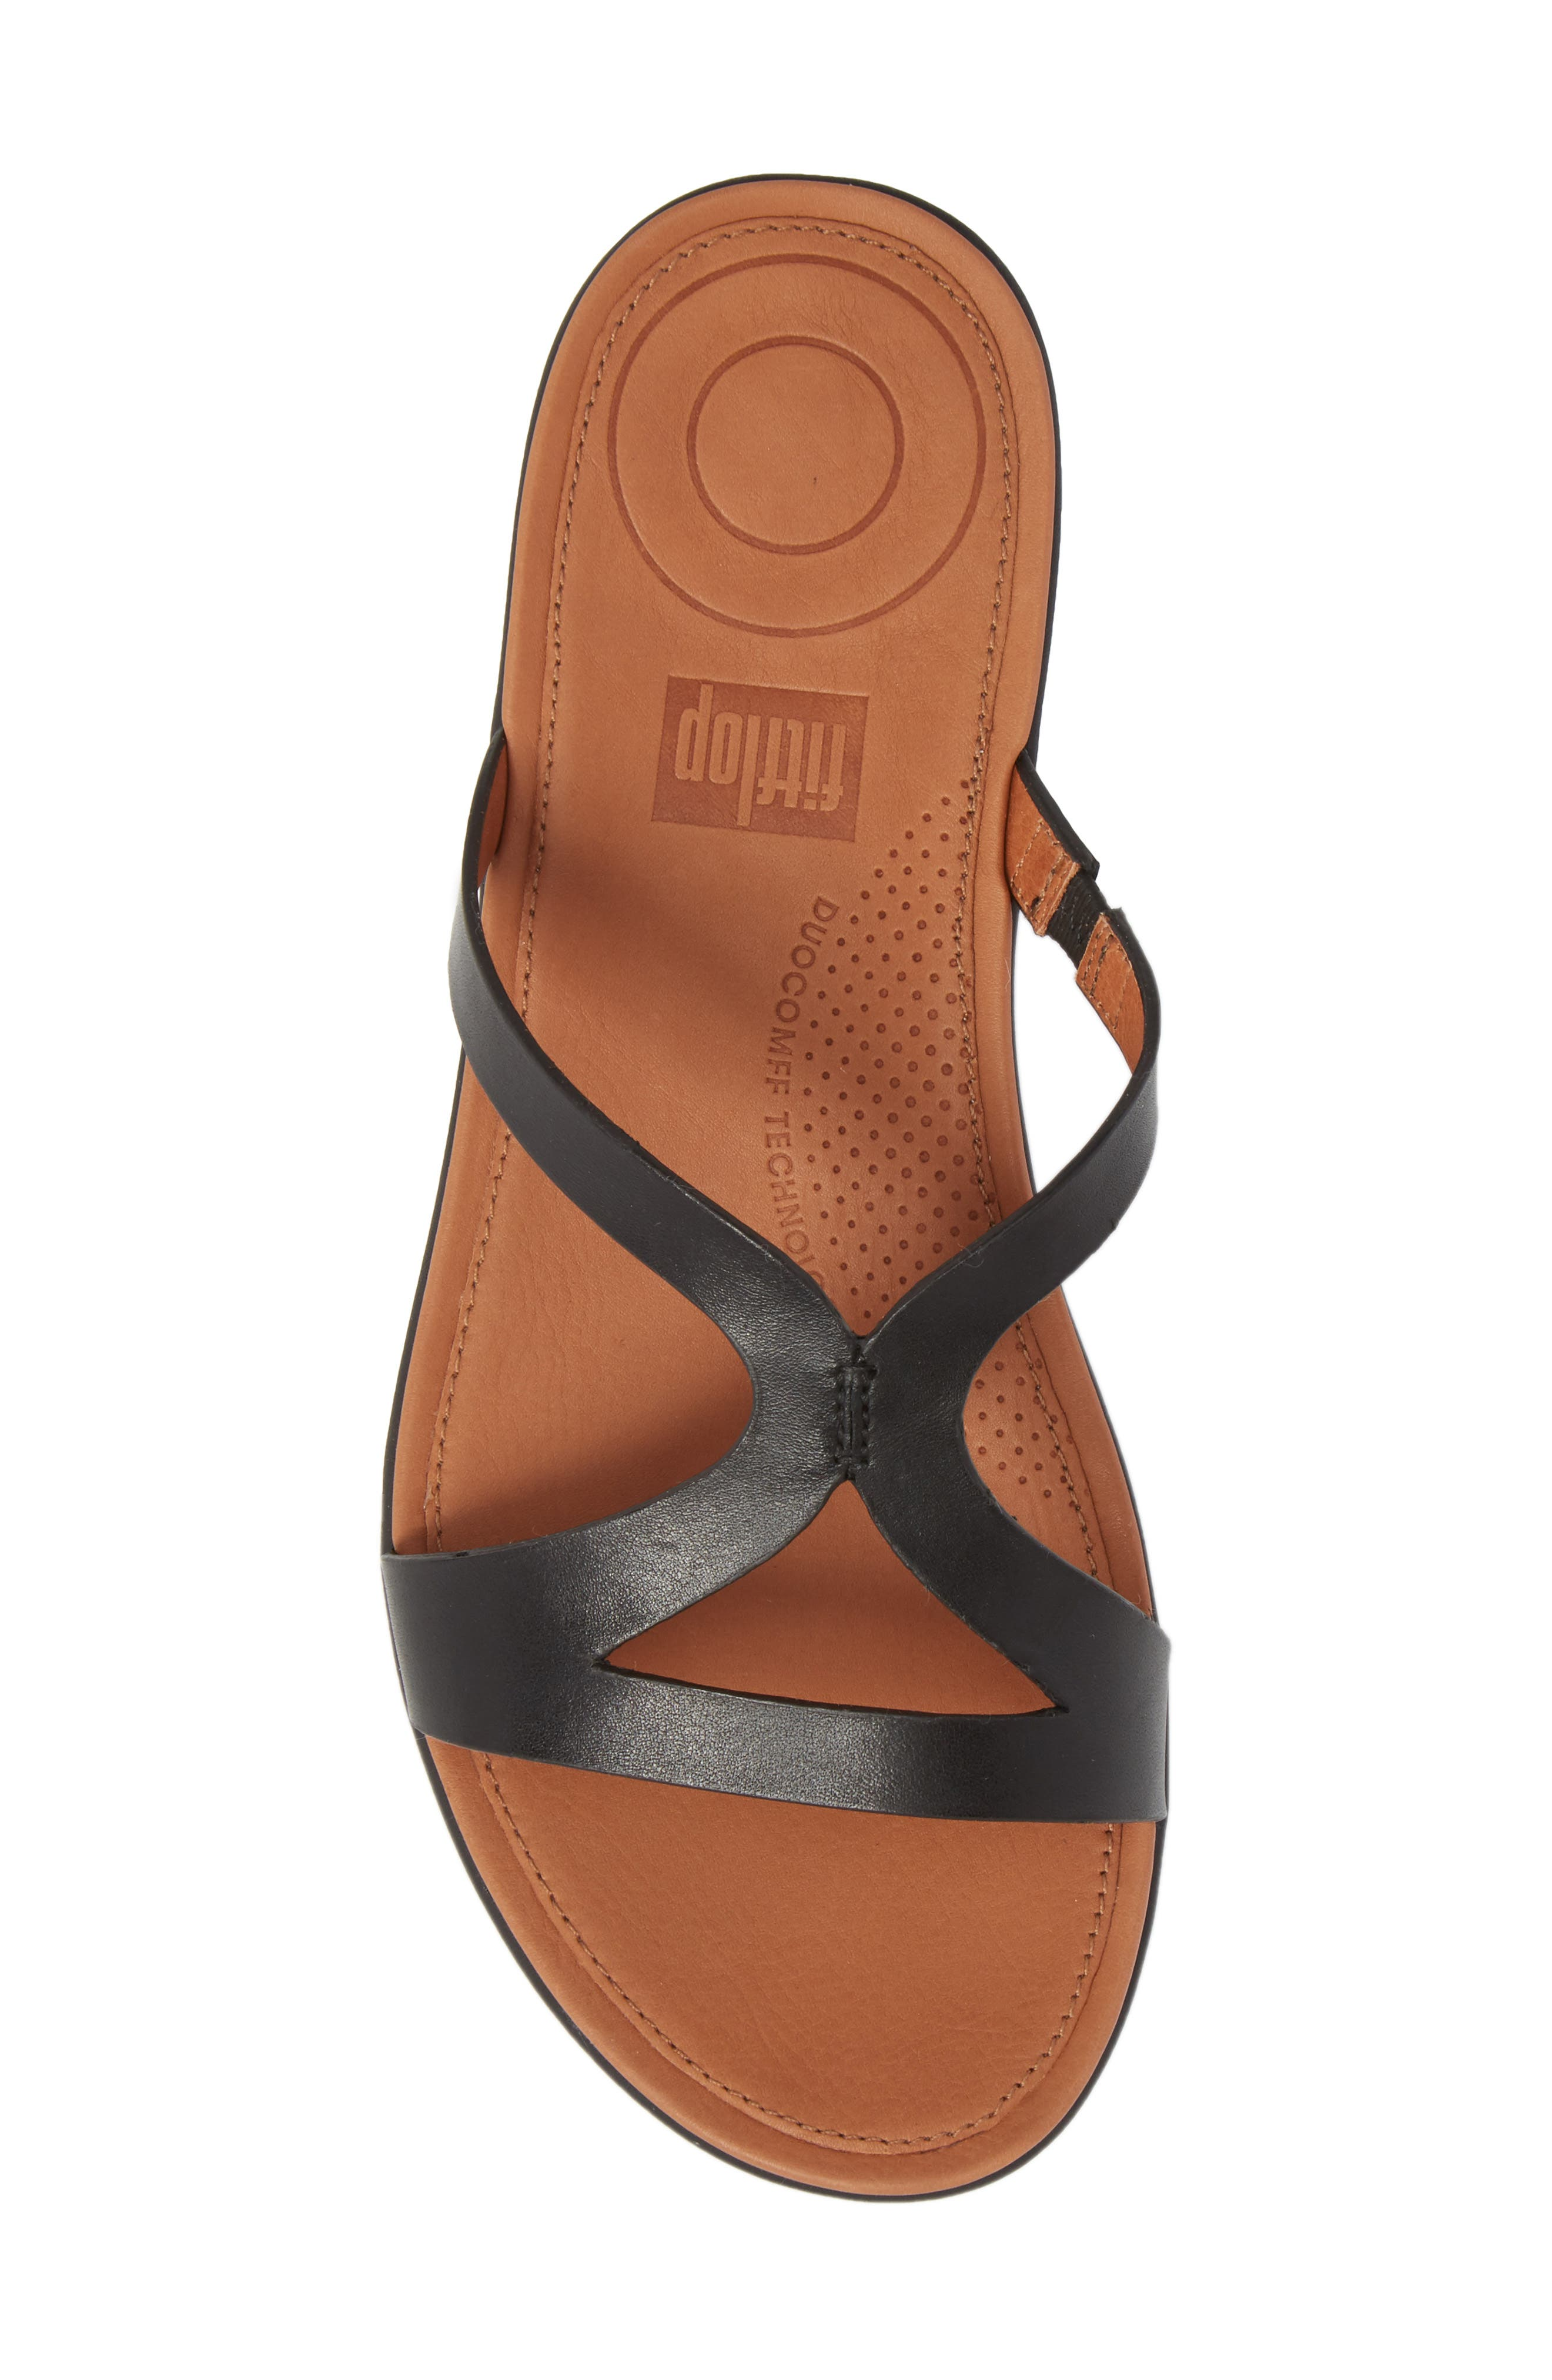 FITFLOP,                             Strata Slide Sandals,                             Alternate thumbnail 5, color,                             001